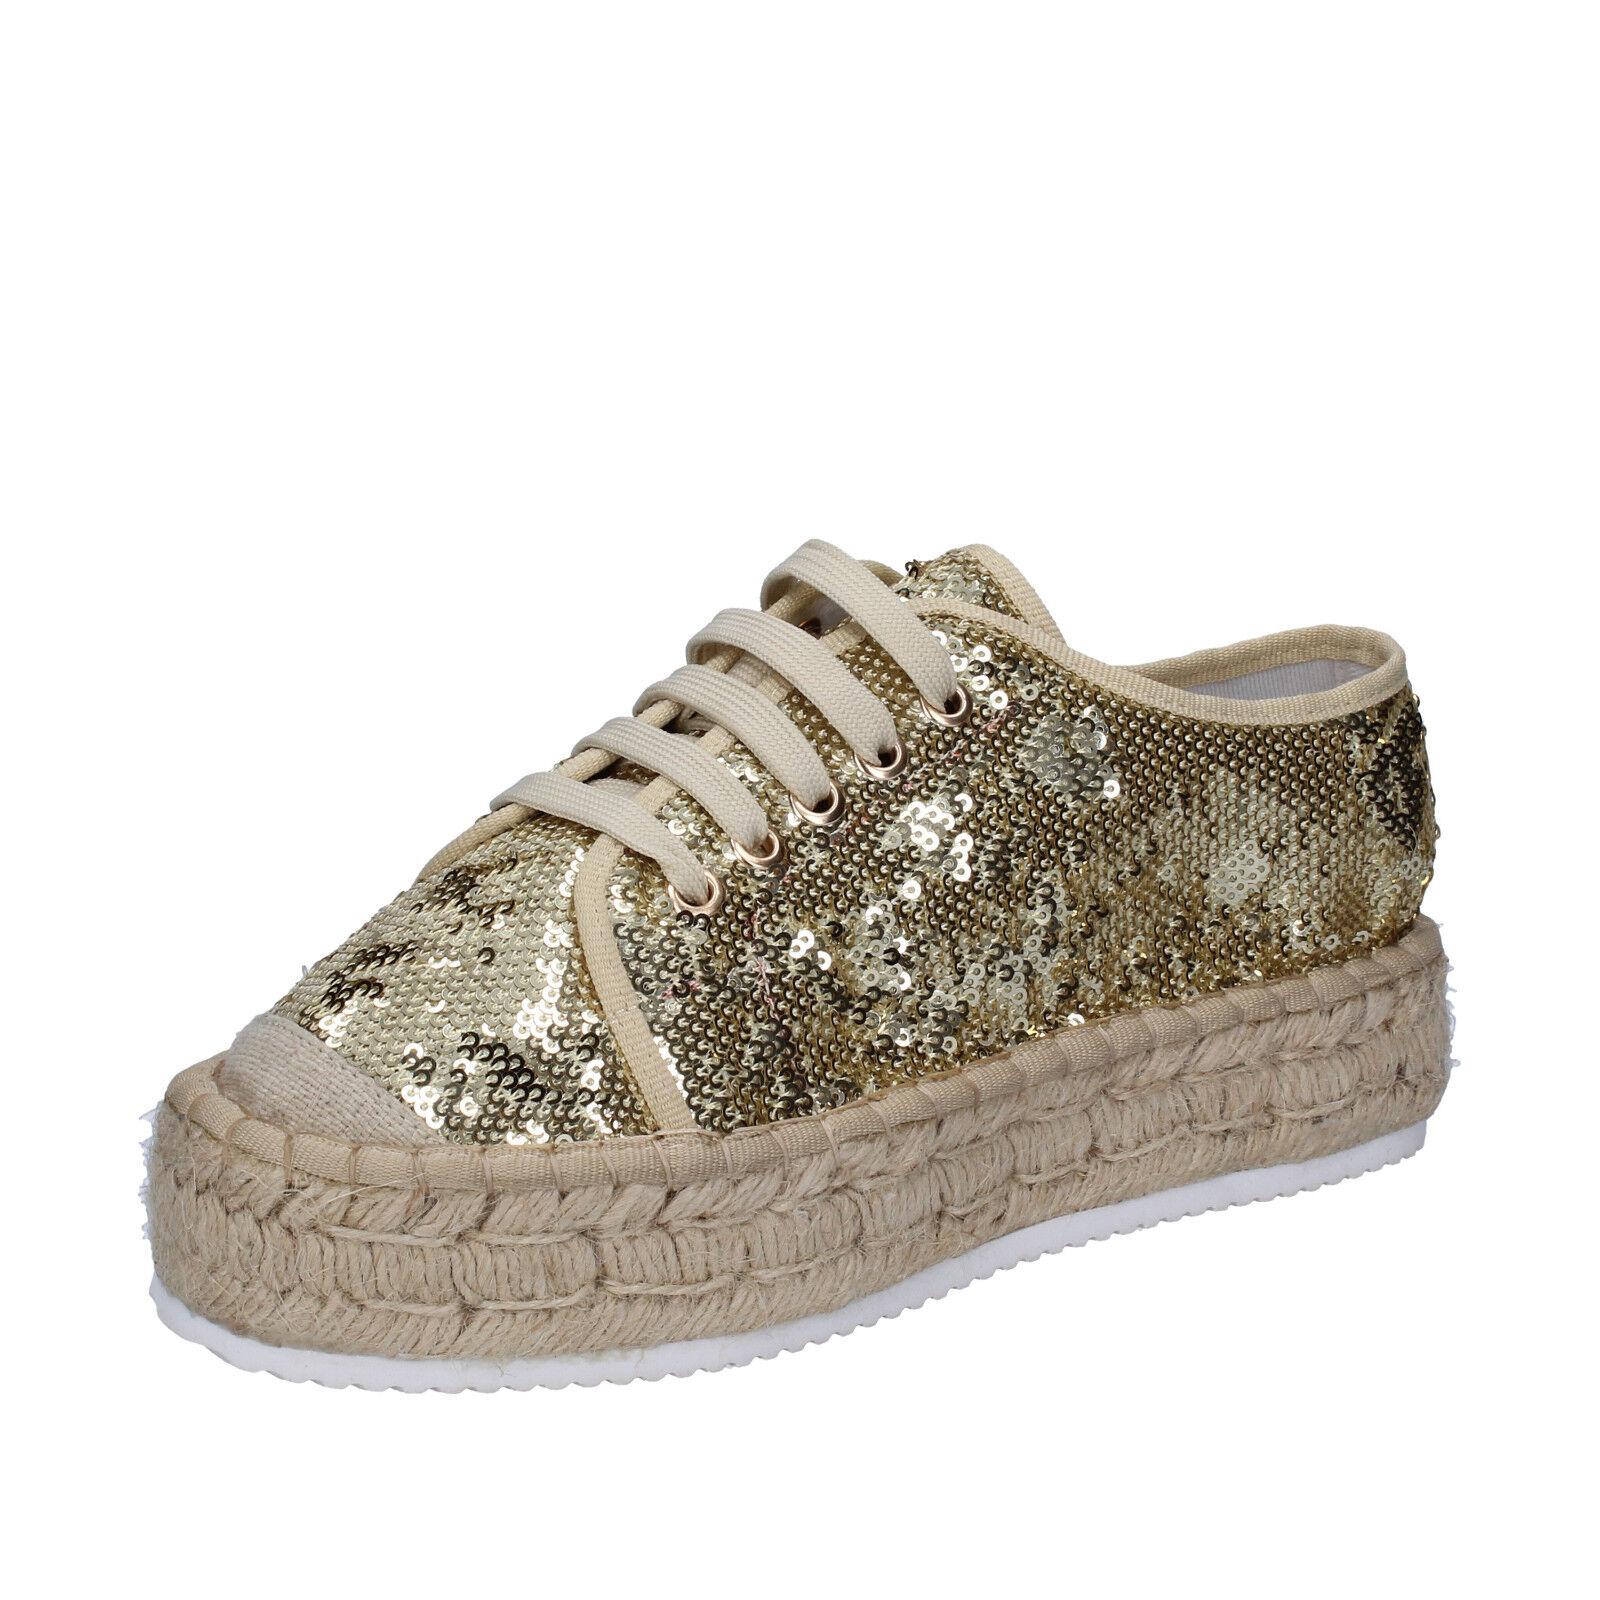 Zapatos para mujer Francesco Milano 5 5 5 (EU 38) ESPADRILLAS Pailettes BS77-38 Platino  bienvenido a elegir